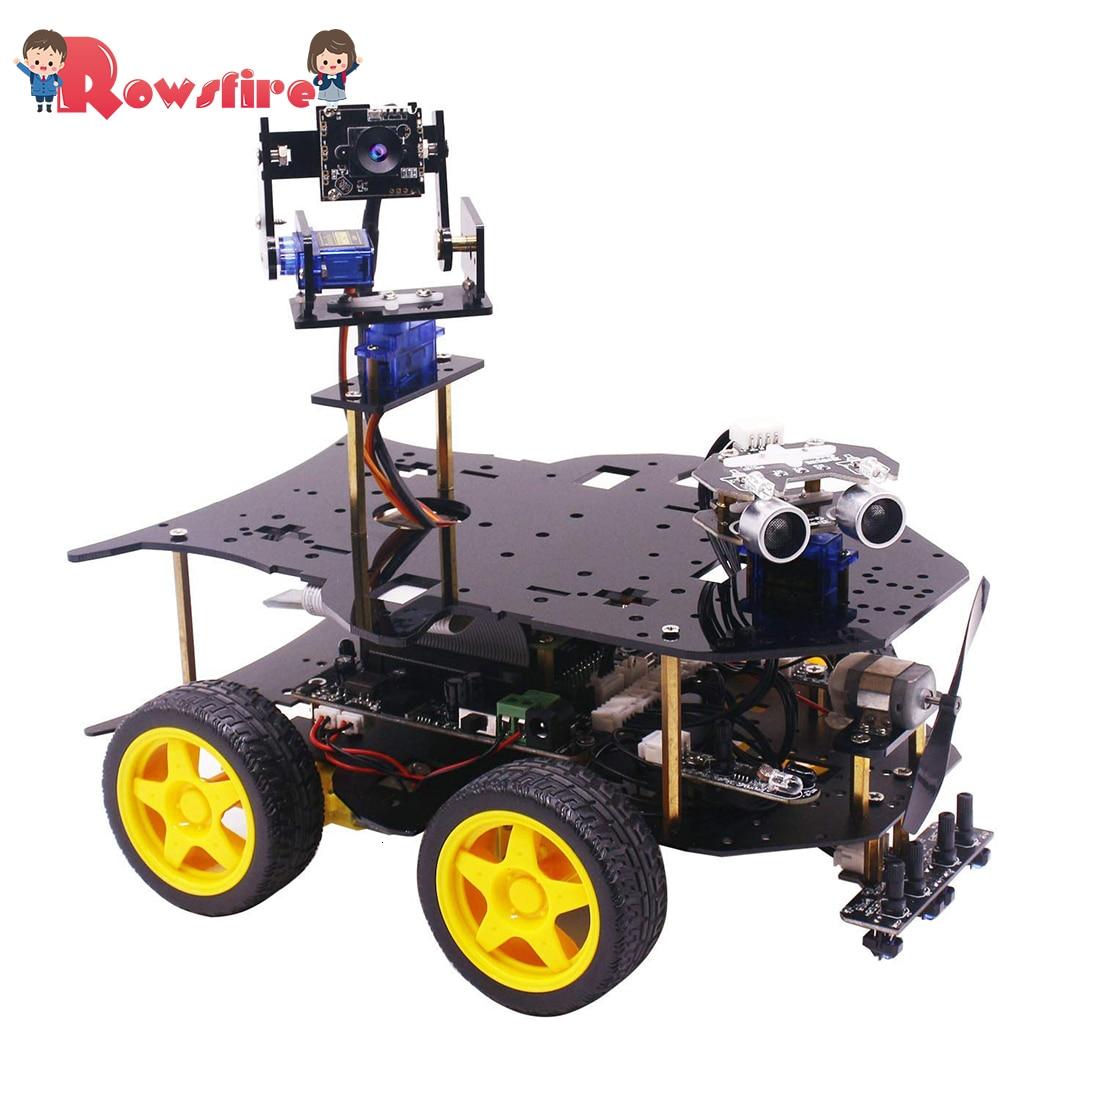 Ultimate Starter Kit for Raspberry Pi HD Camera Programmable Smart Robot Car Kit with 4WD Electronics Education DIY Stem Toy Kit